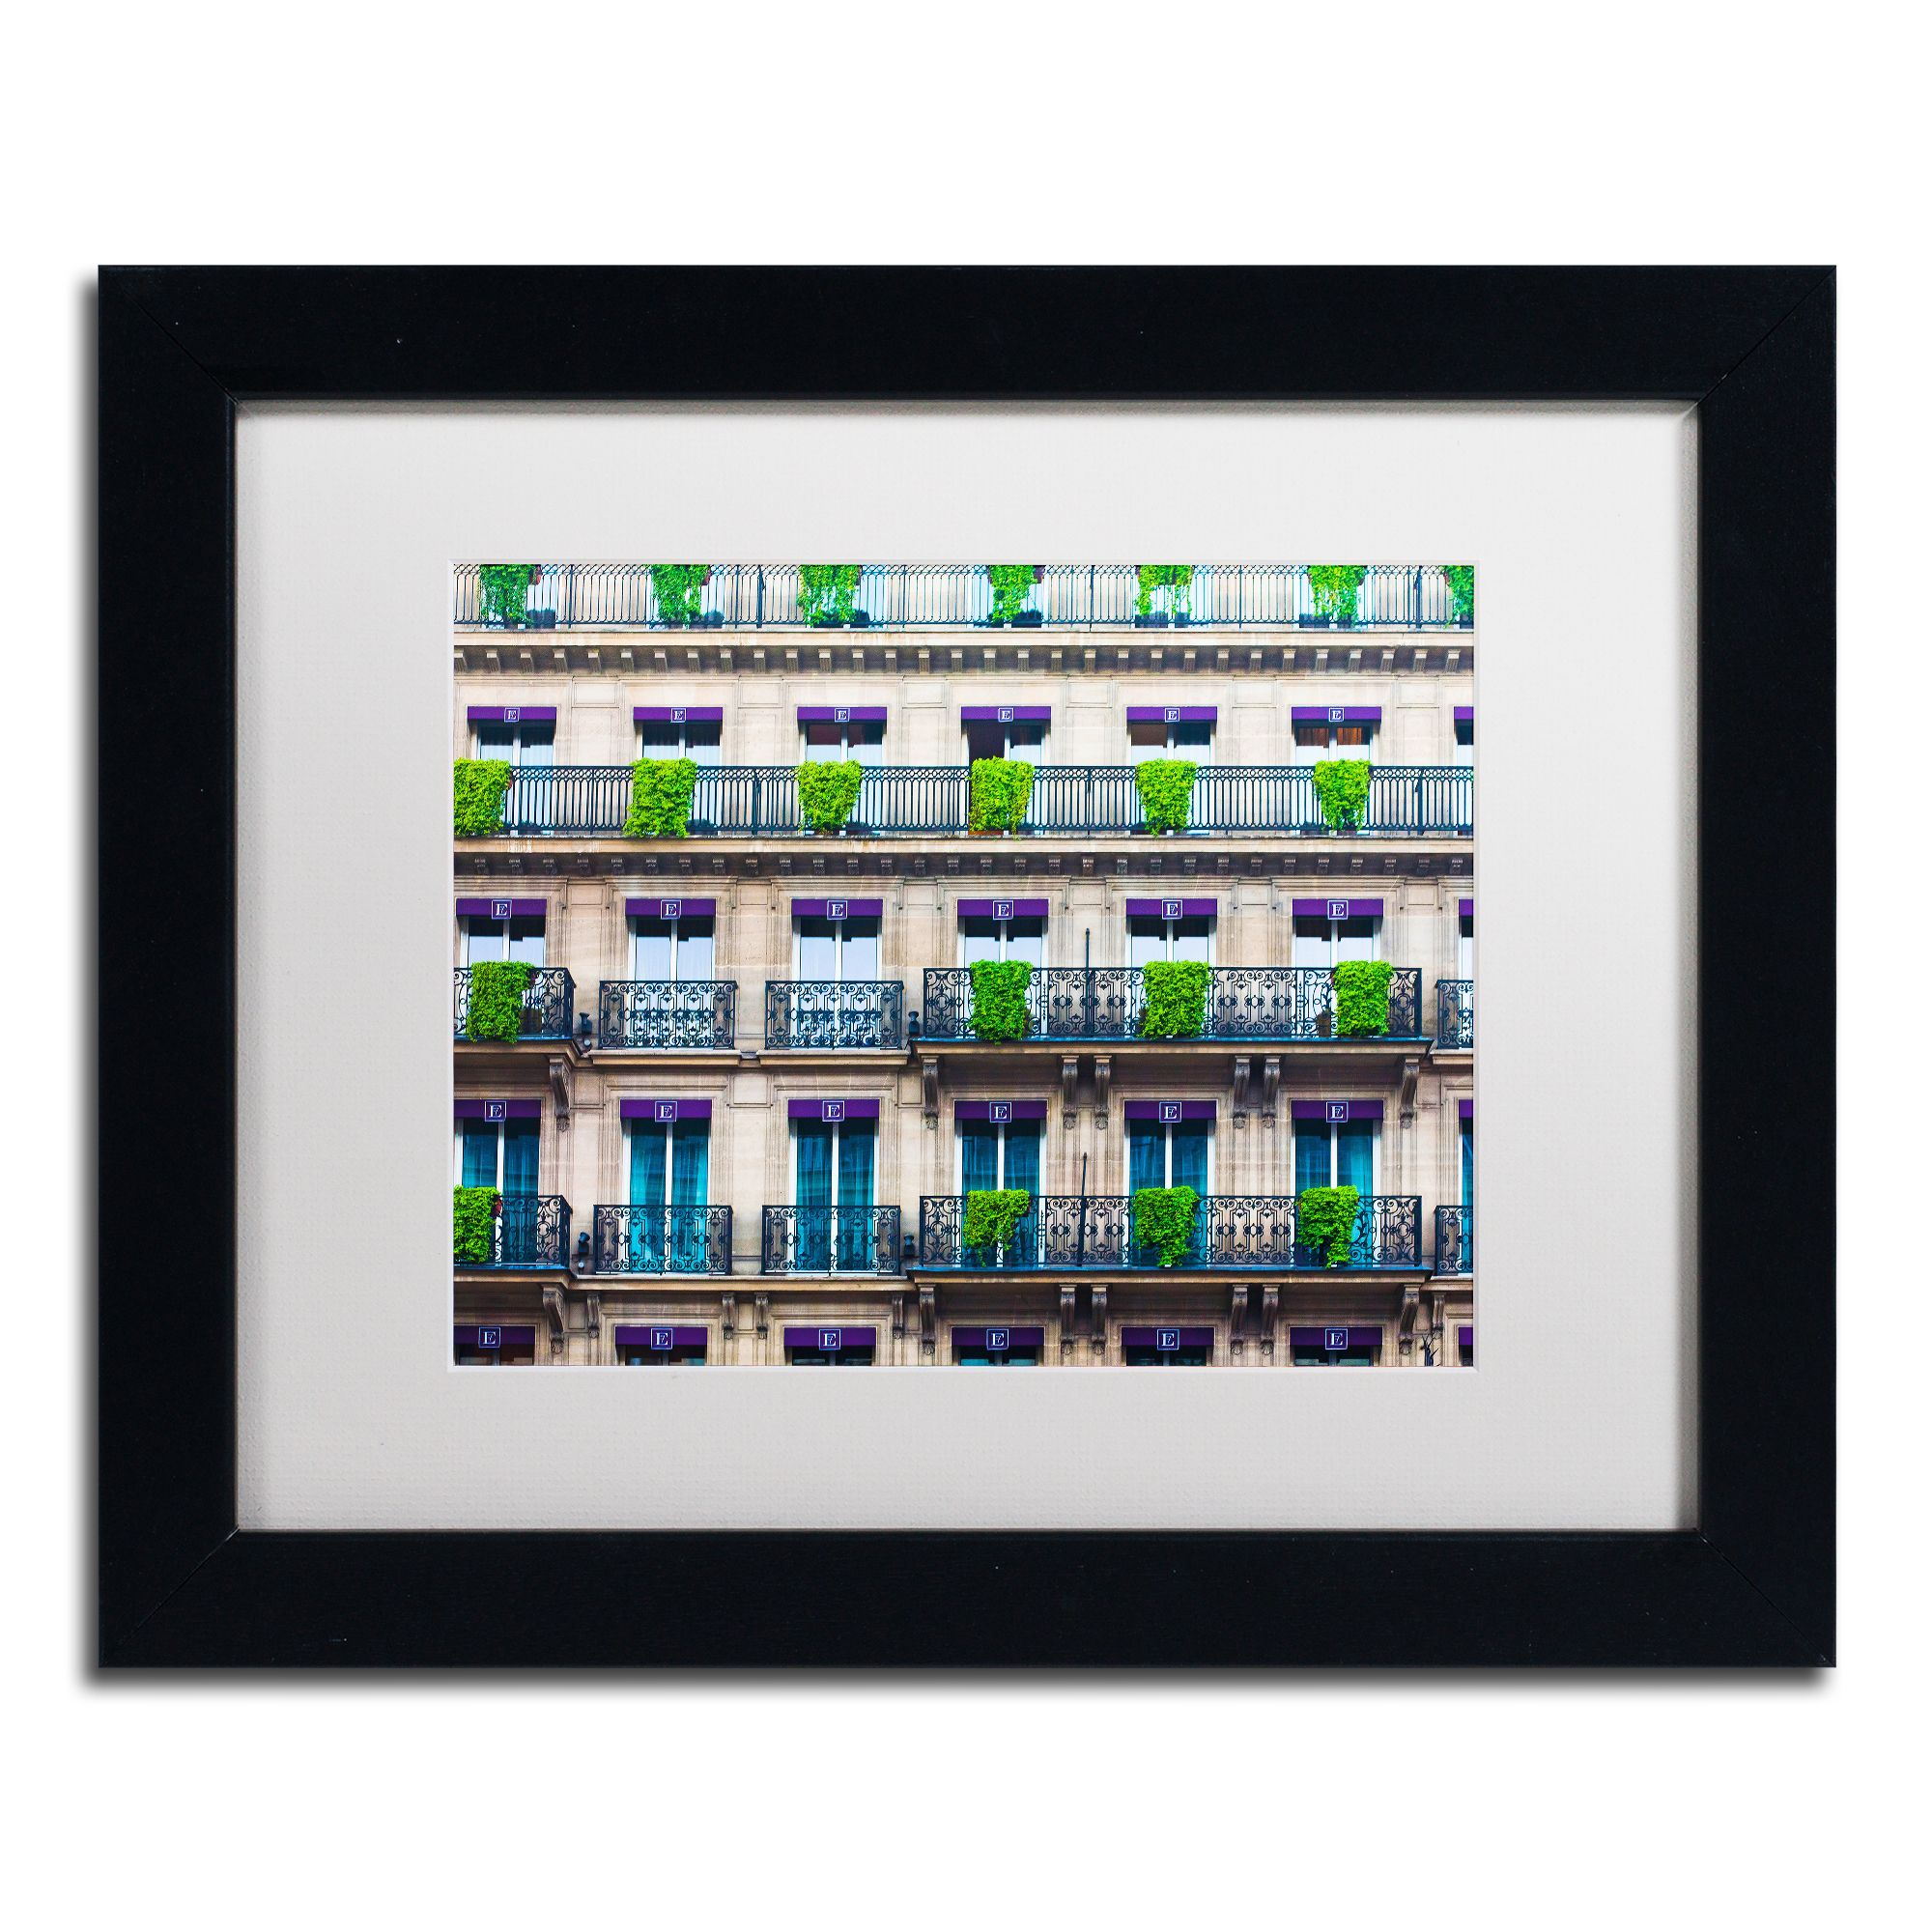 Preston uparisian apartmentsu white matte framed wall art